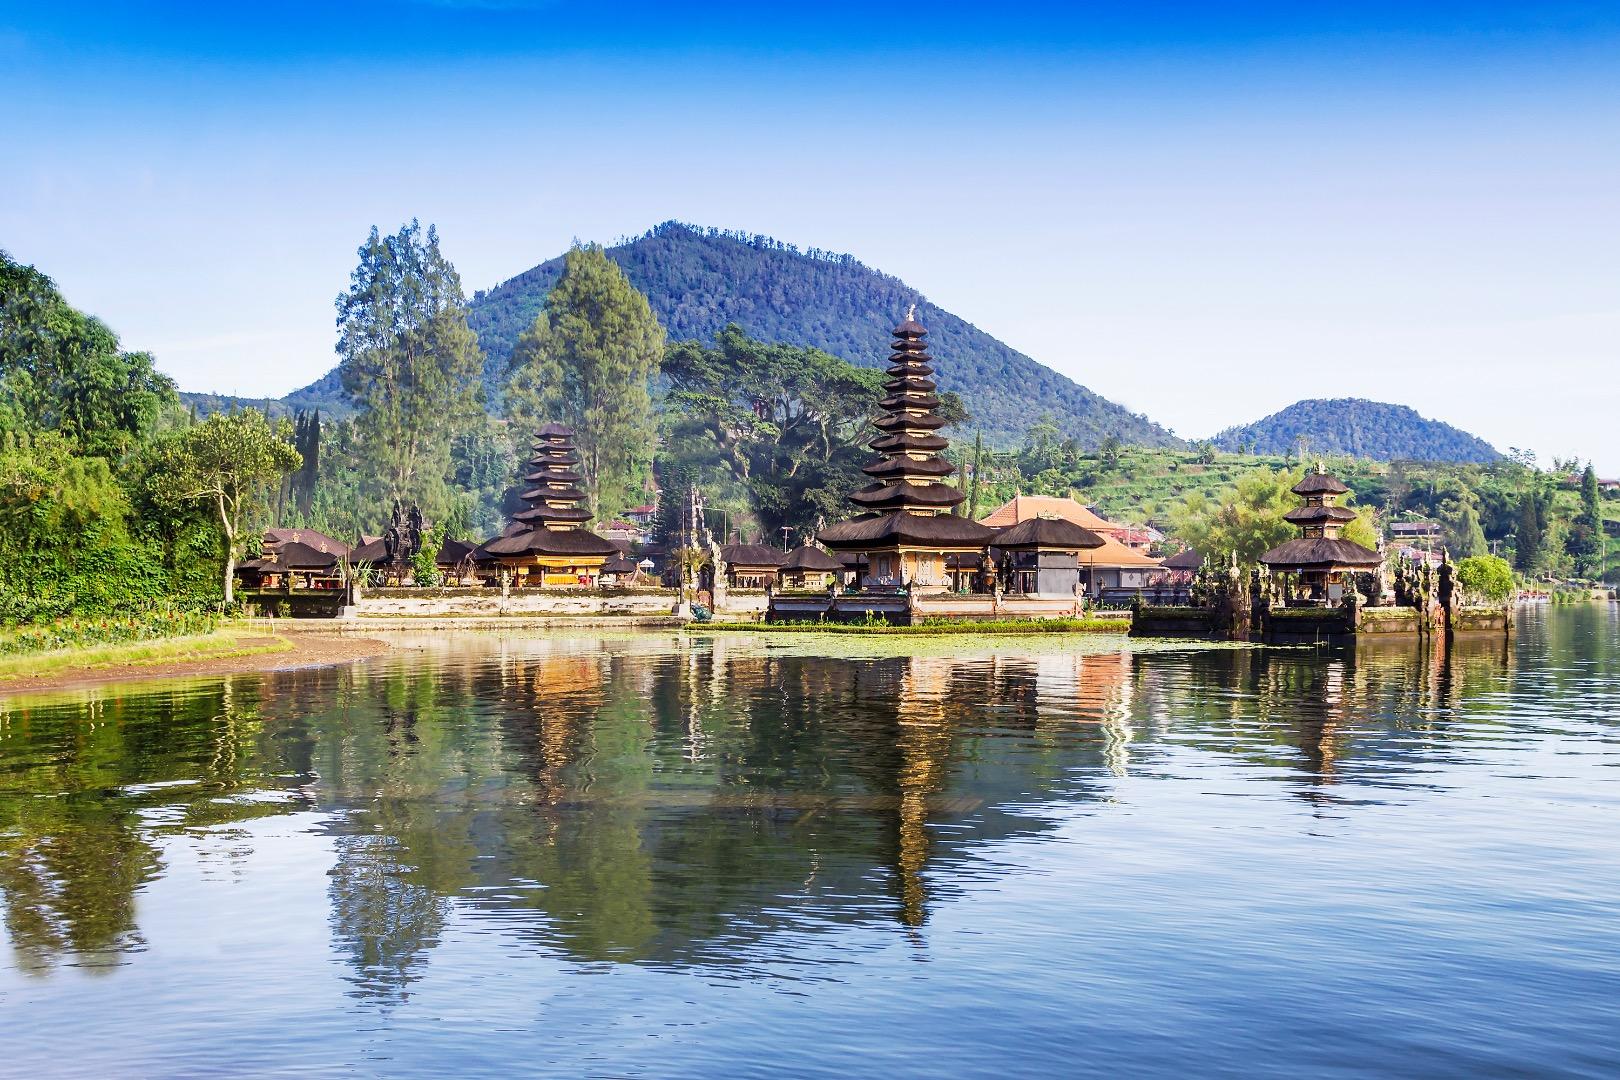 cheap flights to Bali, Denpasar, Indonesia